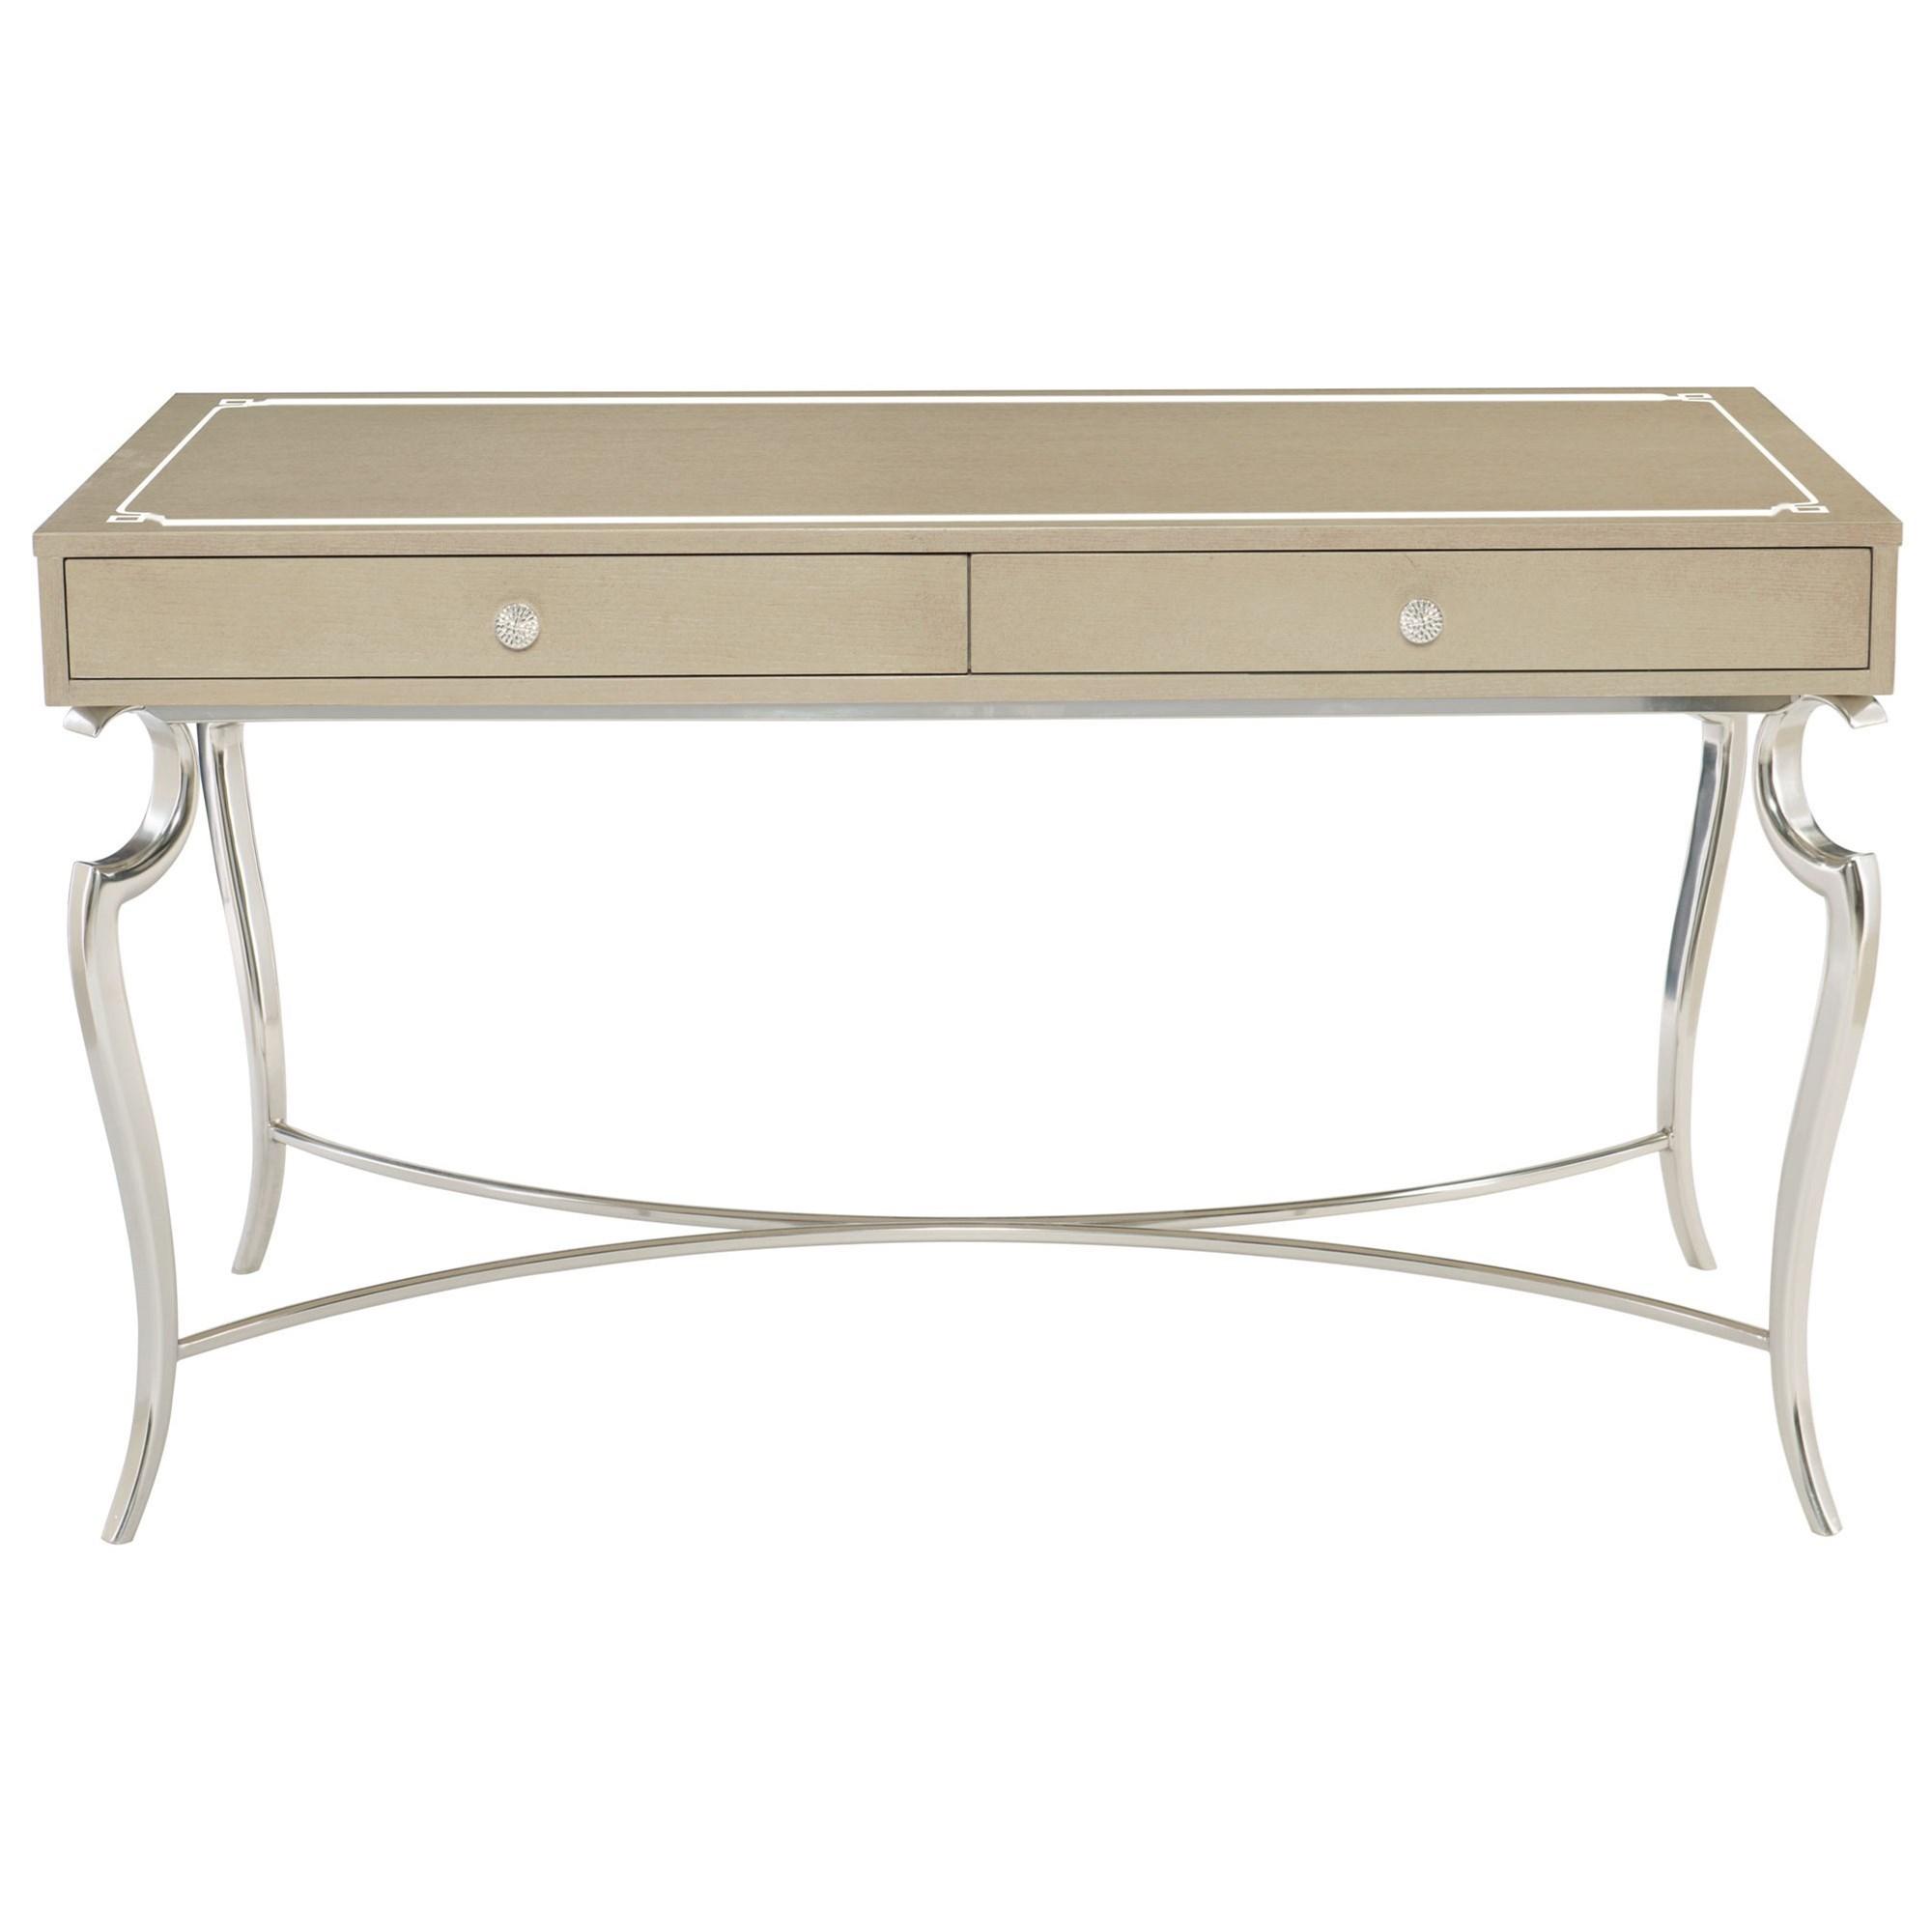 Bernhardt Savoy Place Desk - Item Number: 371-510